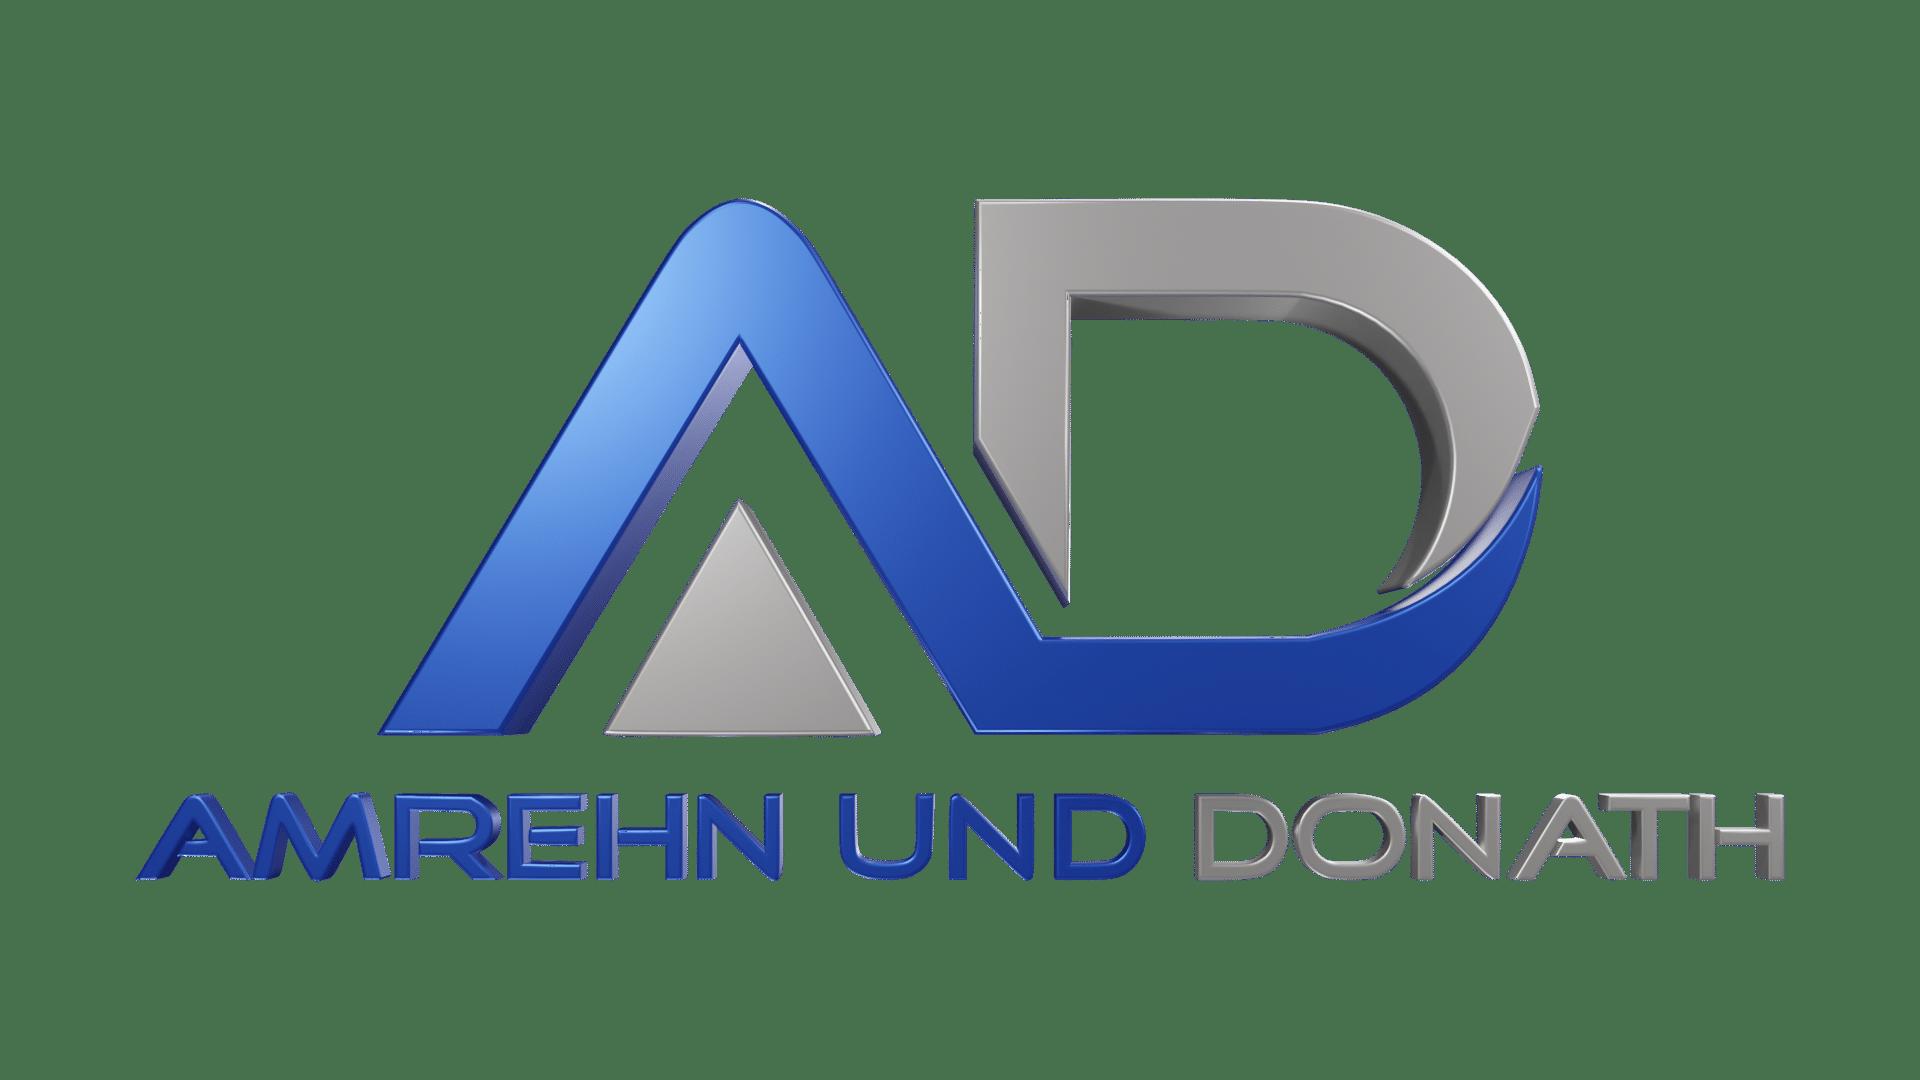 Amrehn & Donath